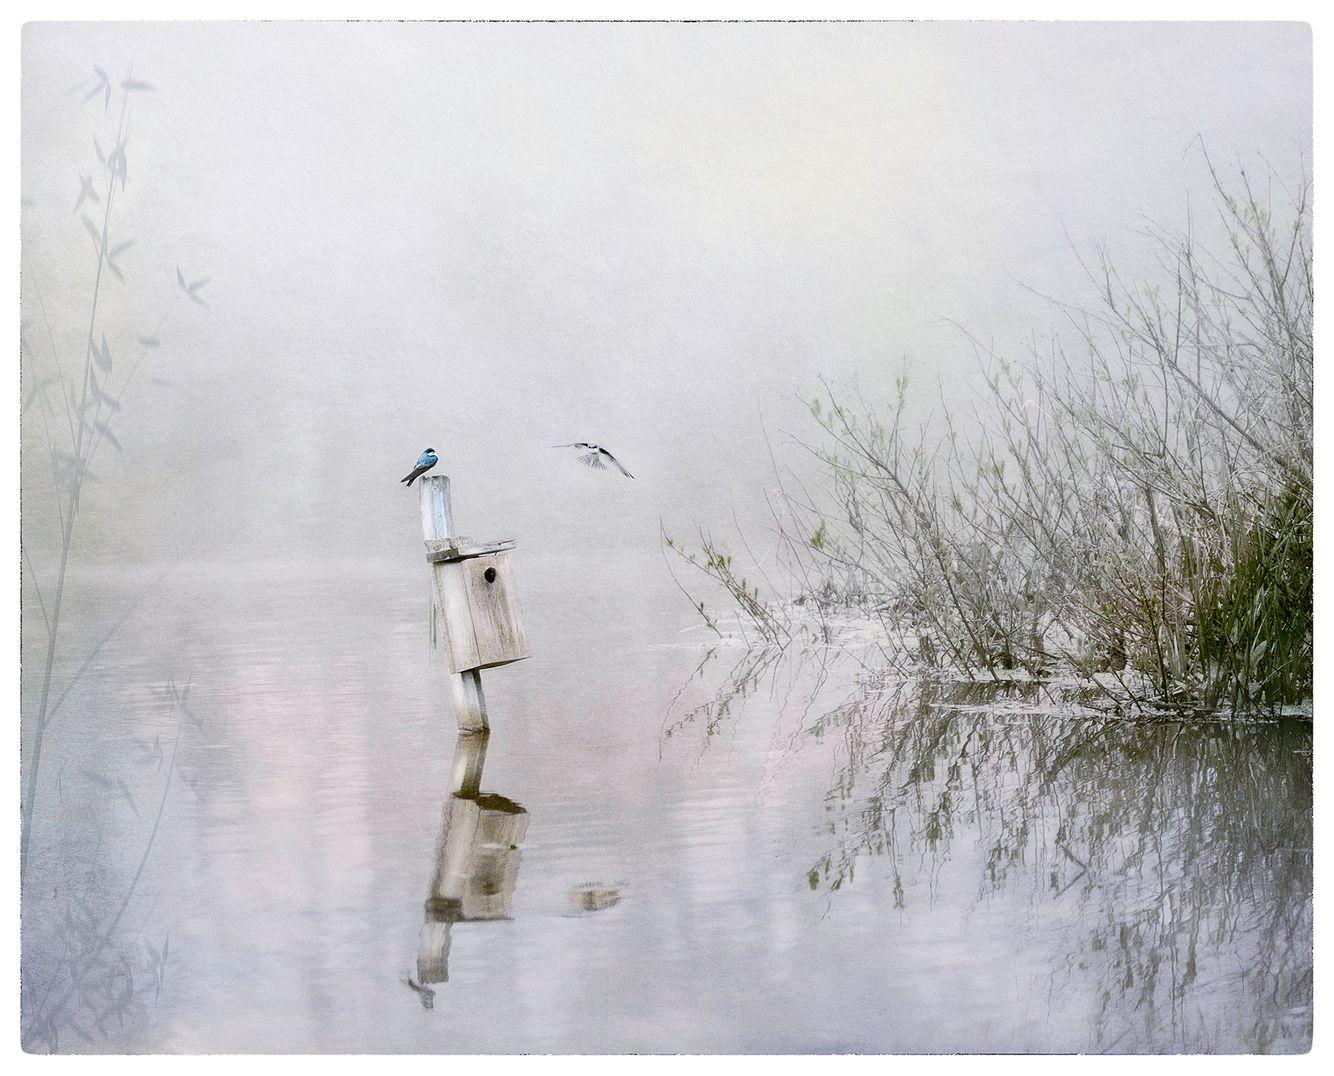 20170501_flemington_fog_0027_11 x 14_mat.jpg